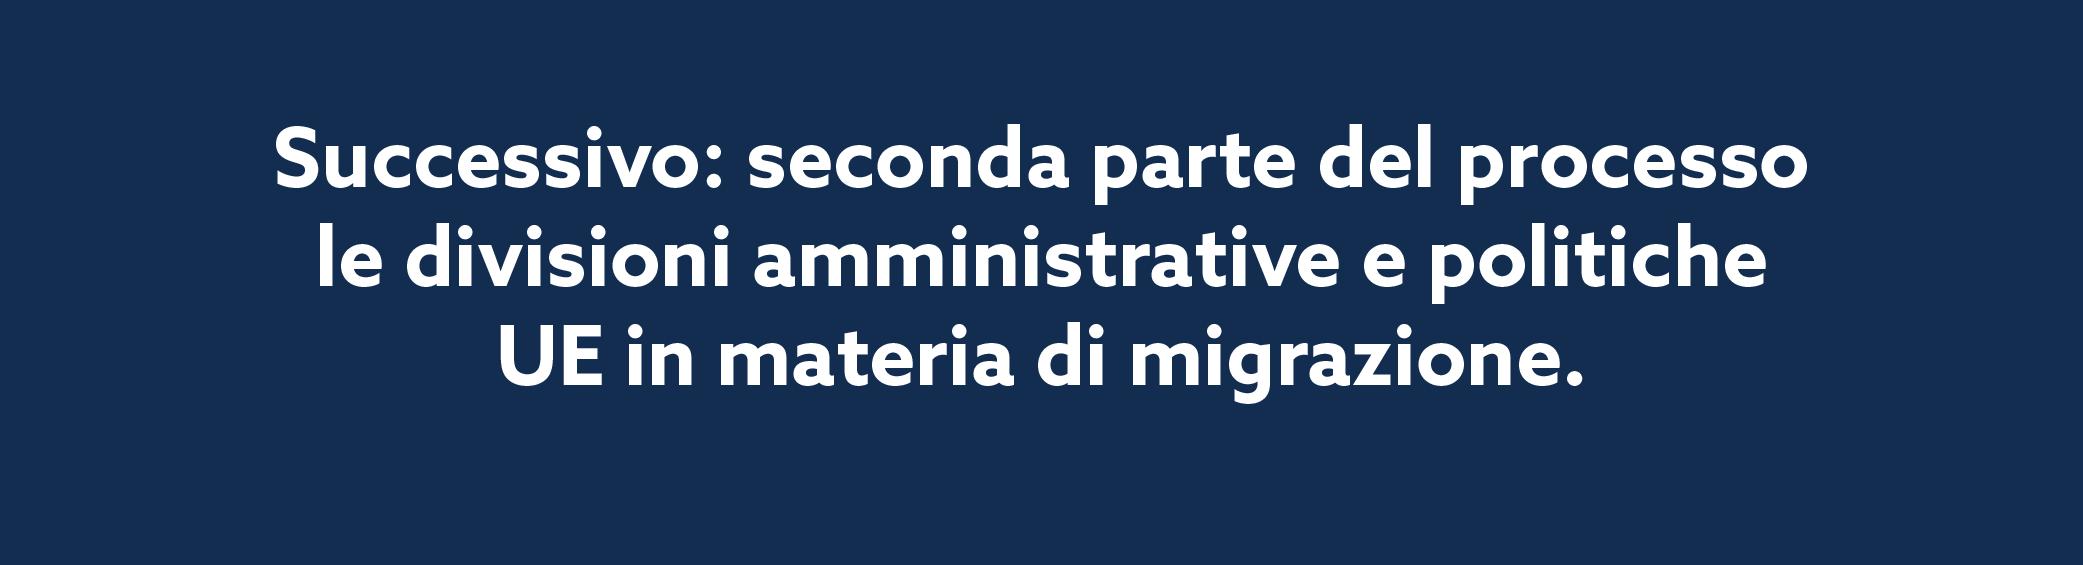 ITALIAN_Migrants_Organized_Part1-13.png